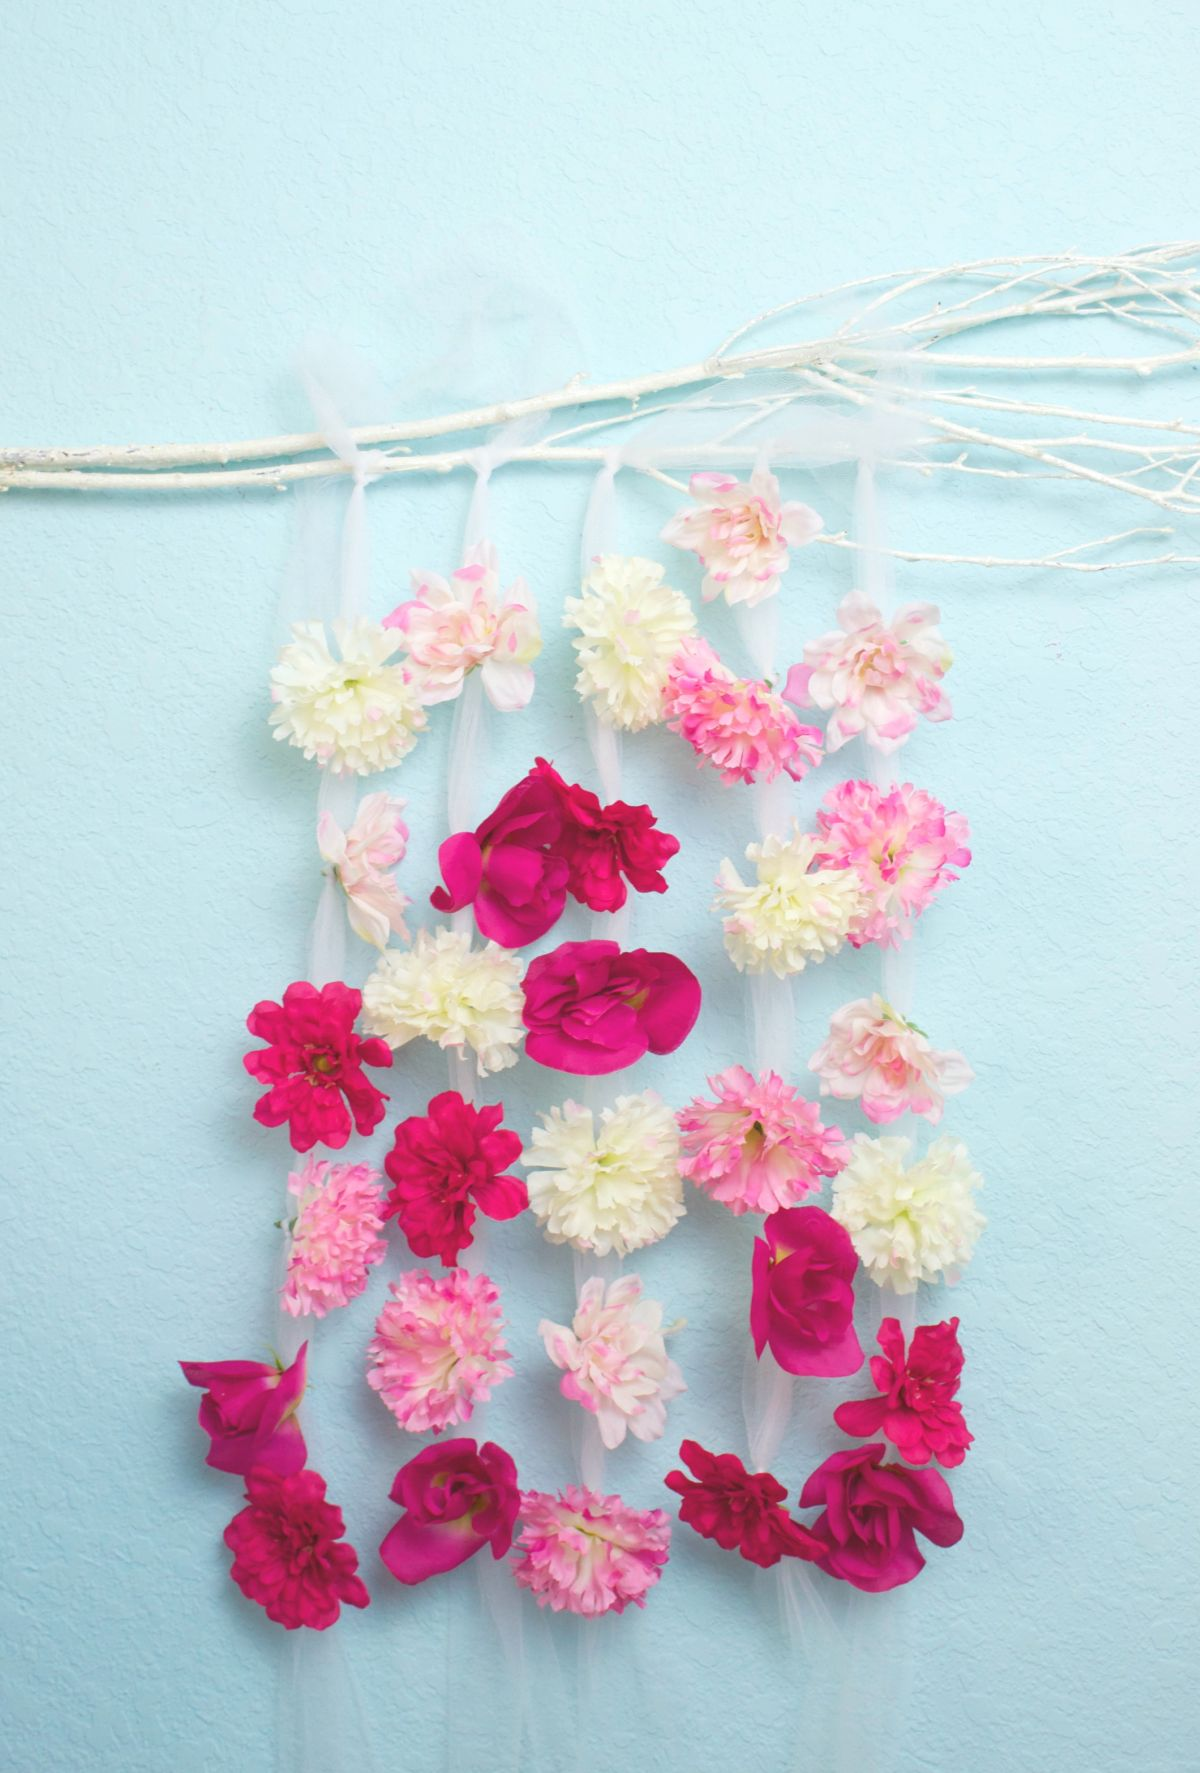 Floral Wall Hanging DIY Decor